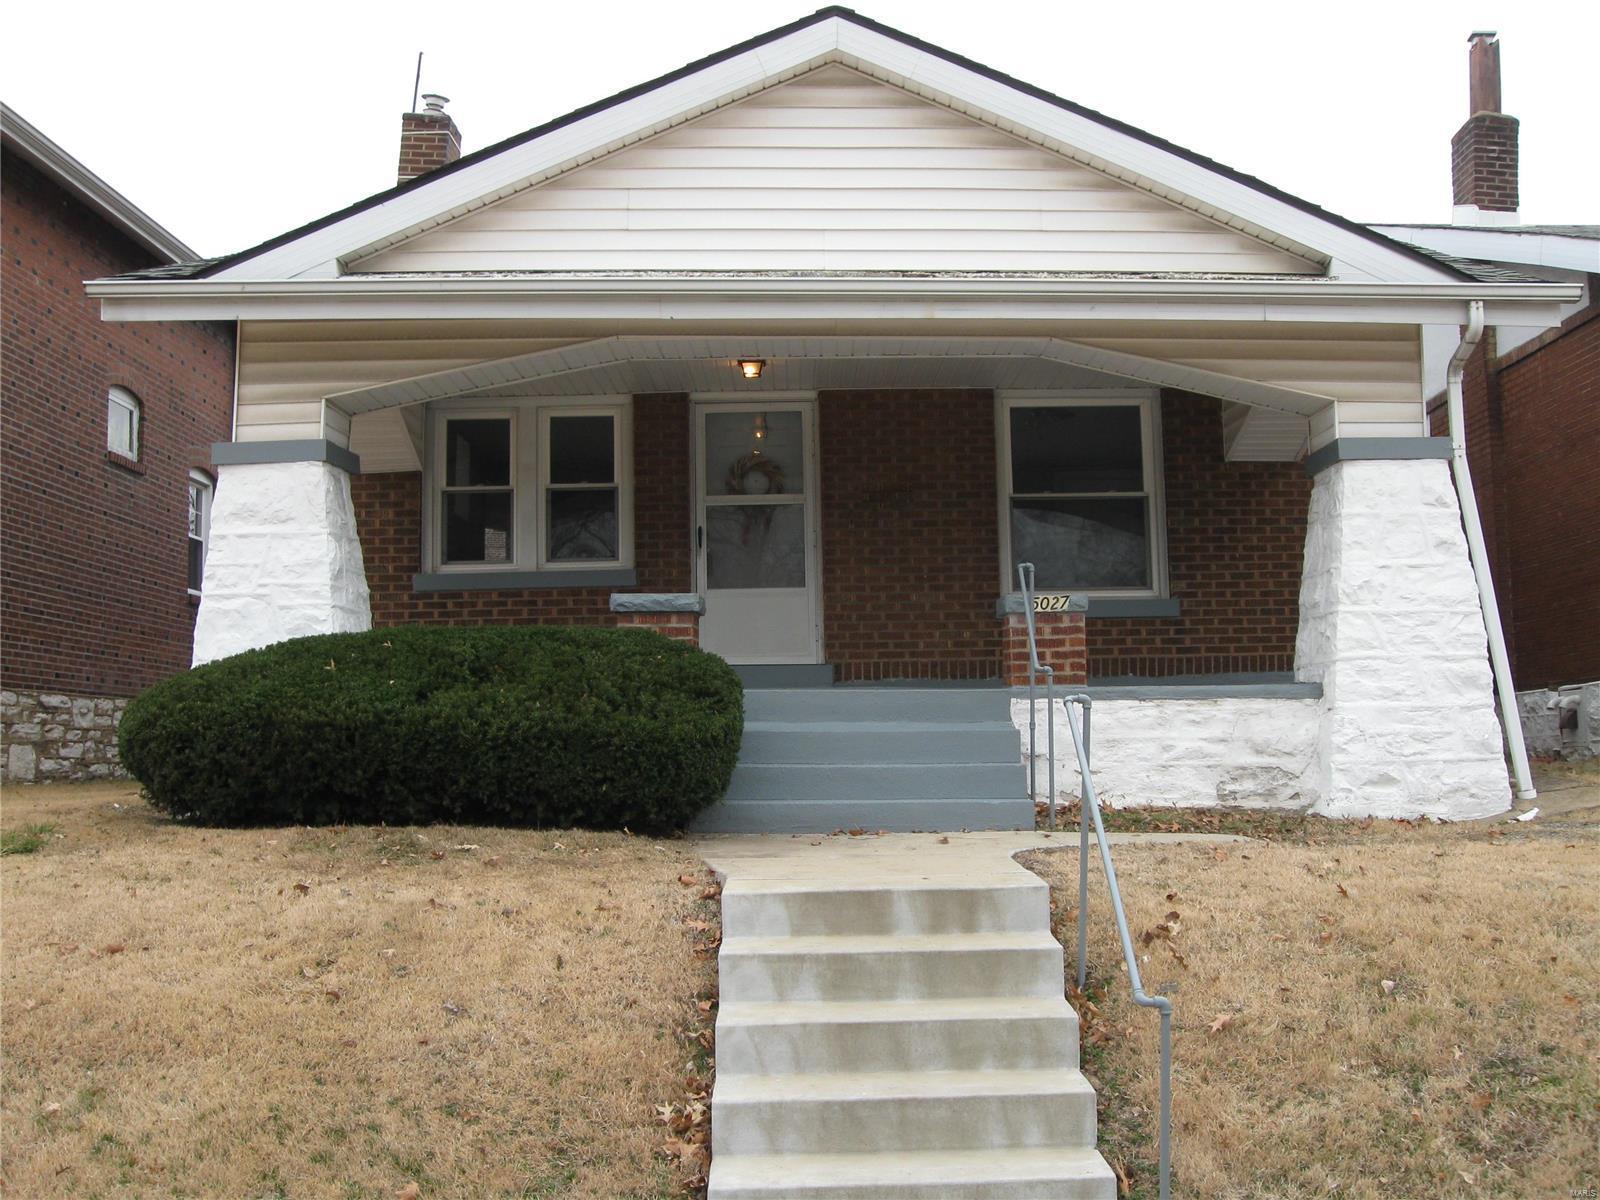 5027 S Kingshighway Boulevard, St Louis, MO 63109